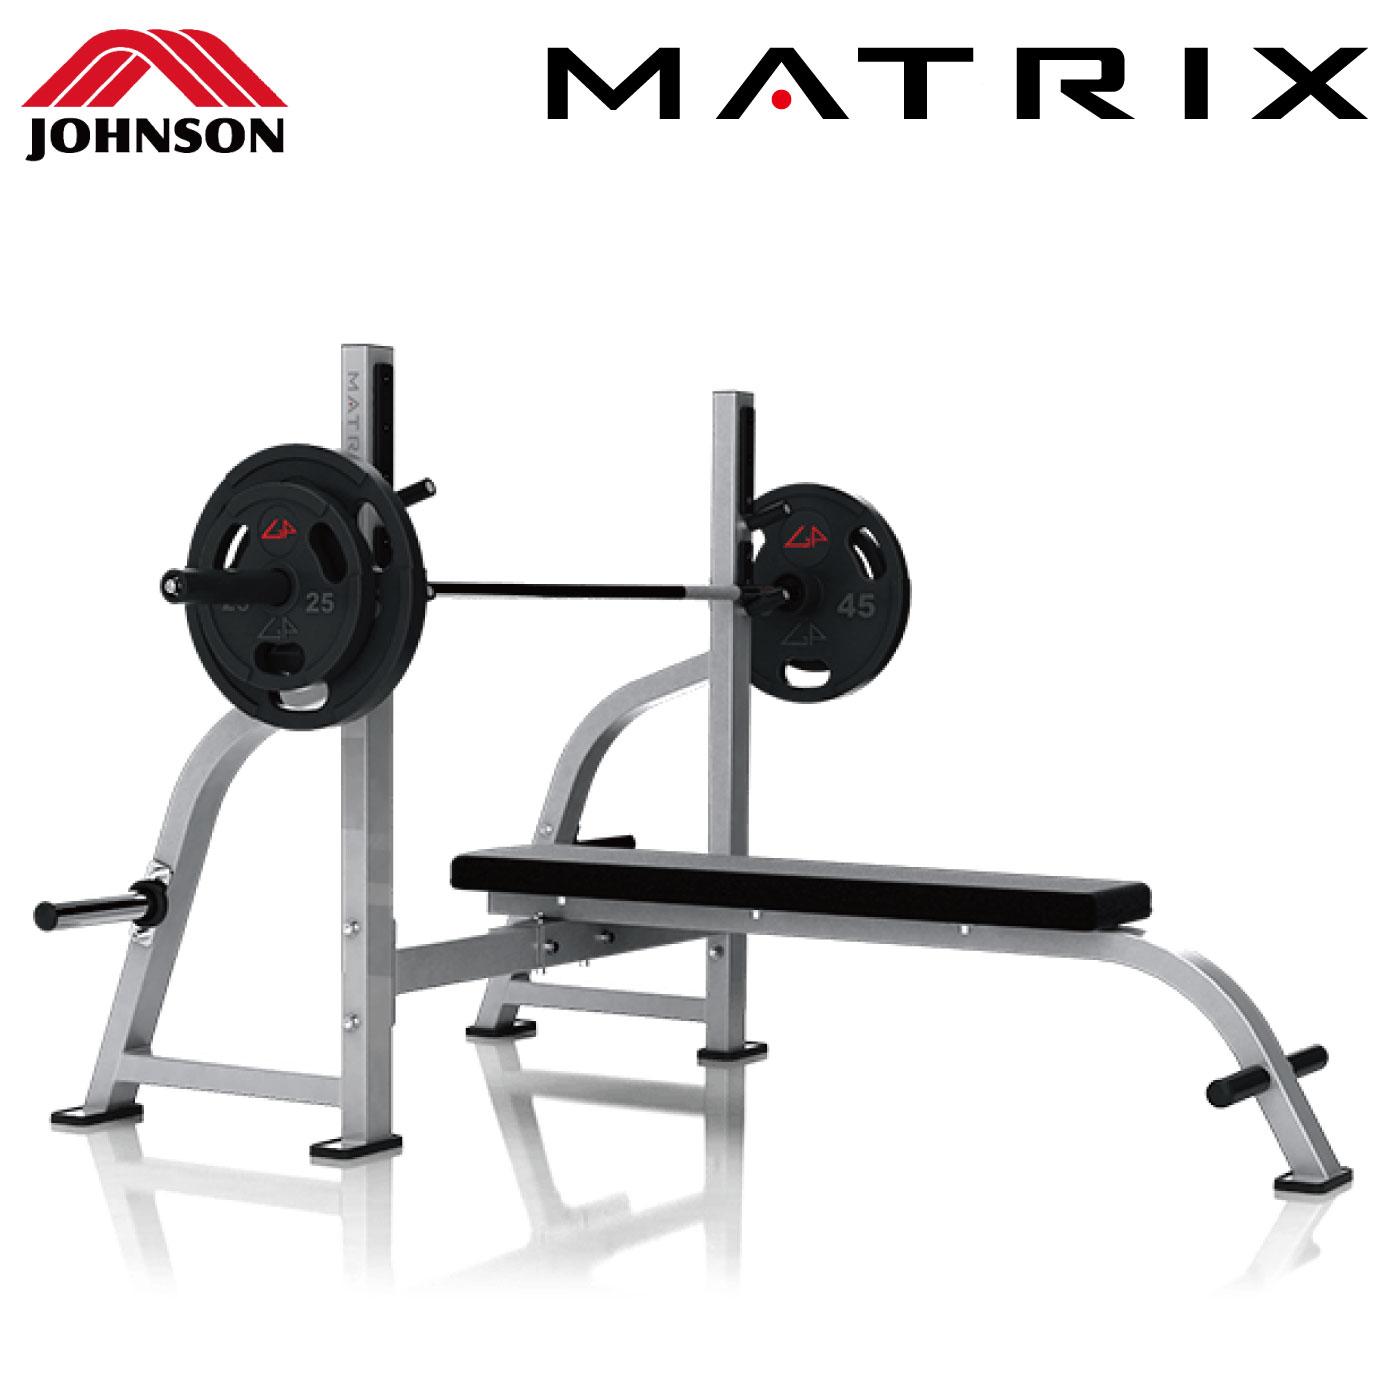 G1-FW163(オリンピックフラットベンチ)〈G1シリーズ〉/業務用ストレングスマシン〈業務用MATRIX〉《ジョンソンヘルステック》